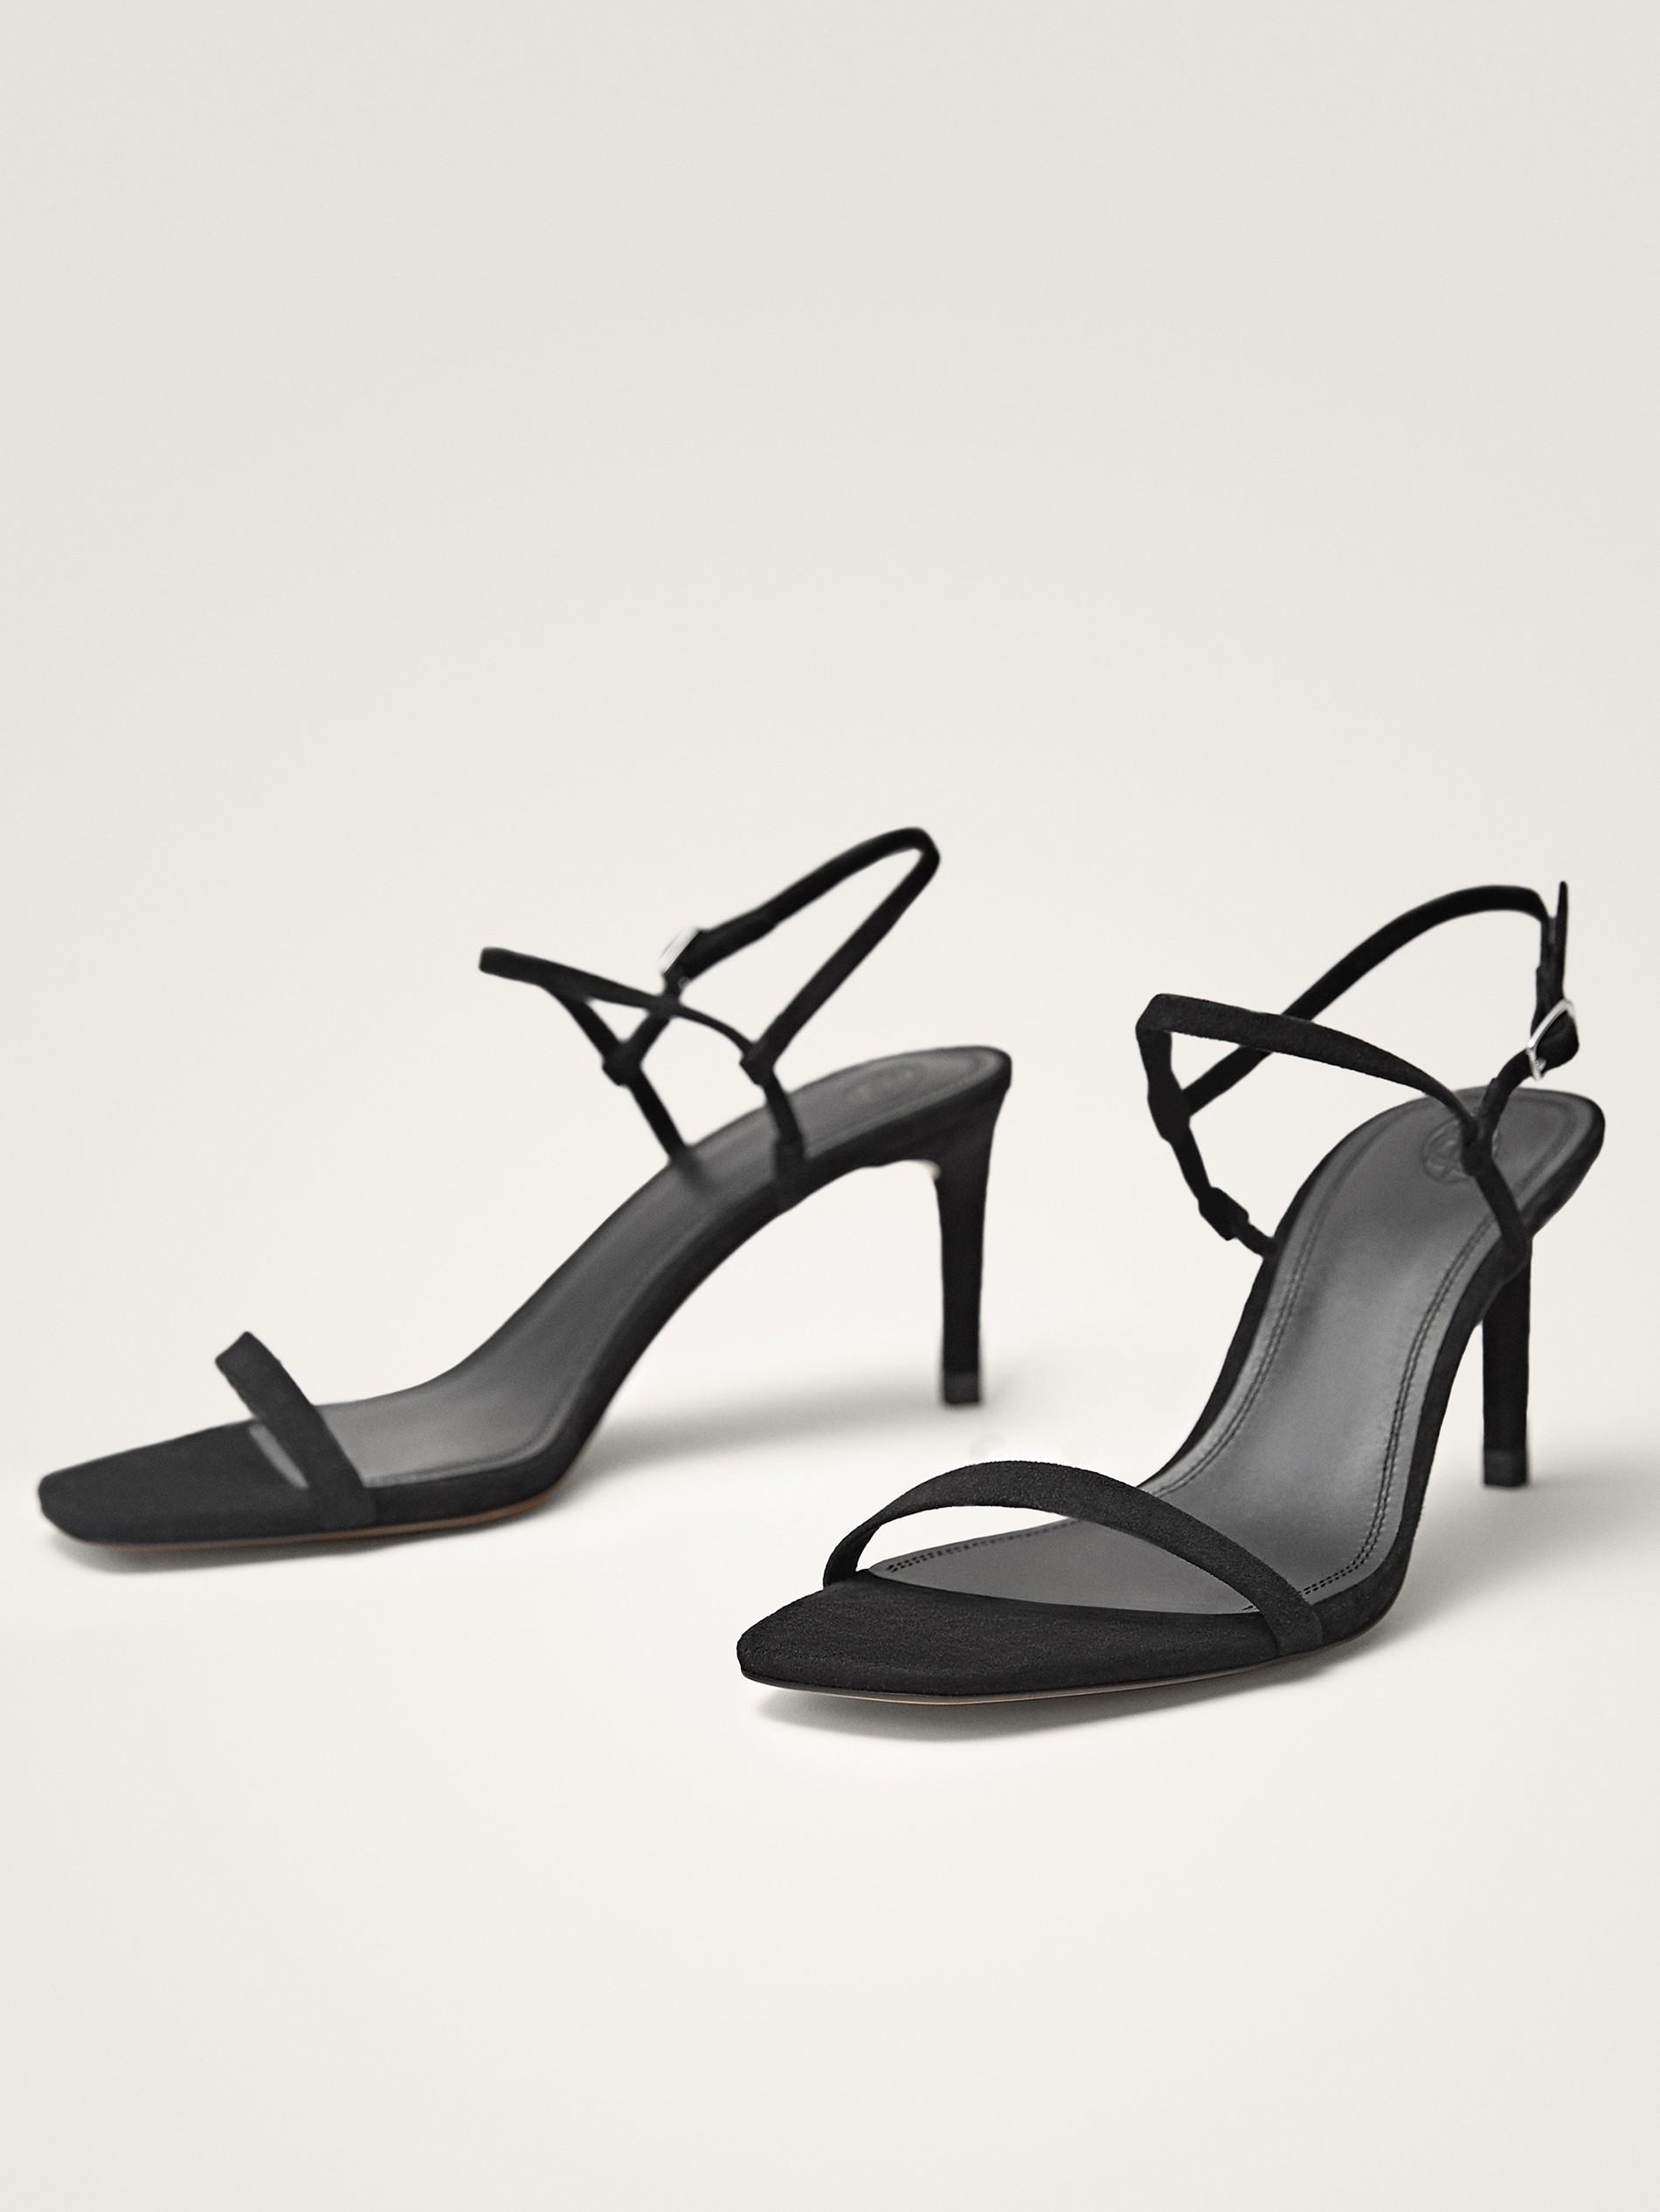 High Suede Sandals Heel Suede Black Black BdexCor